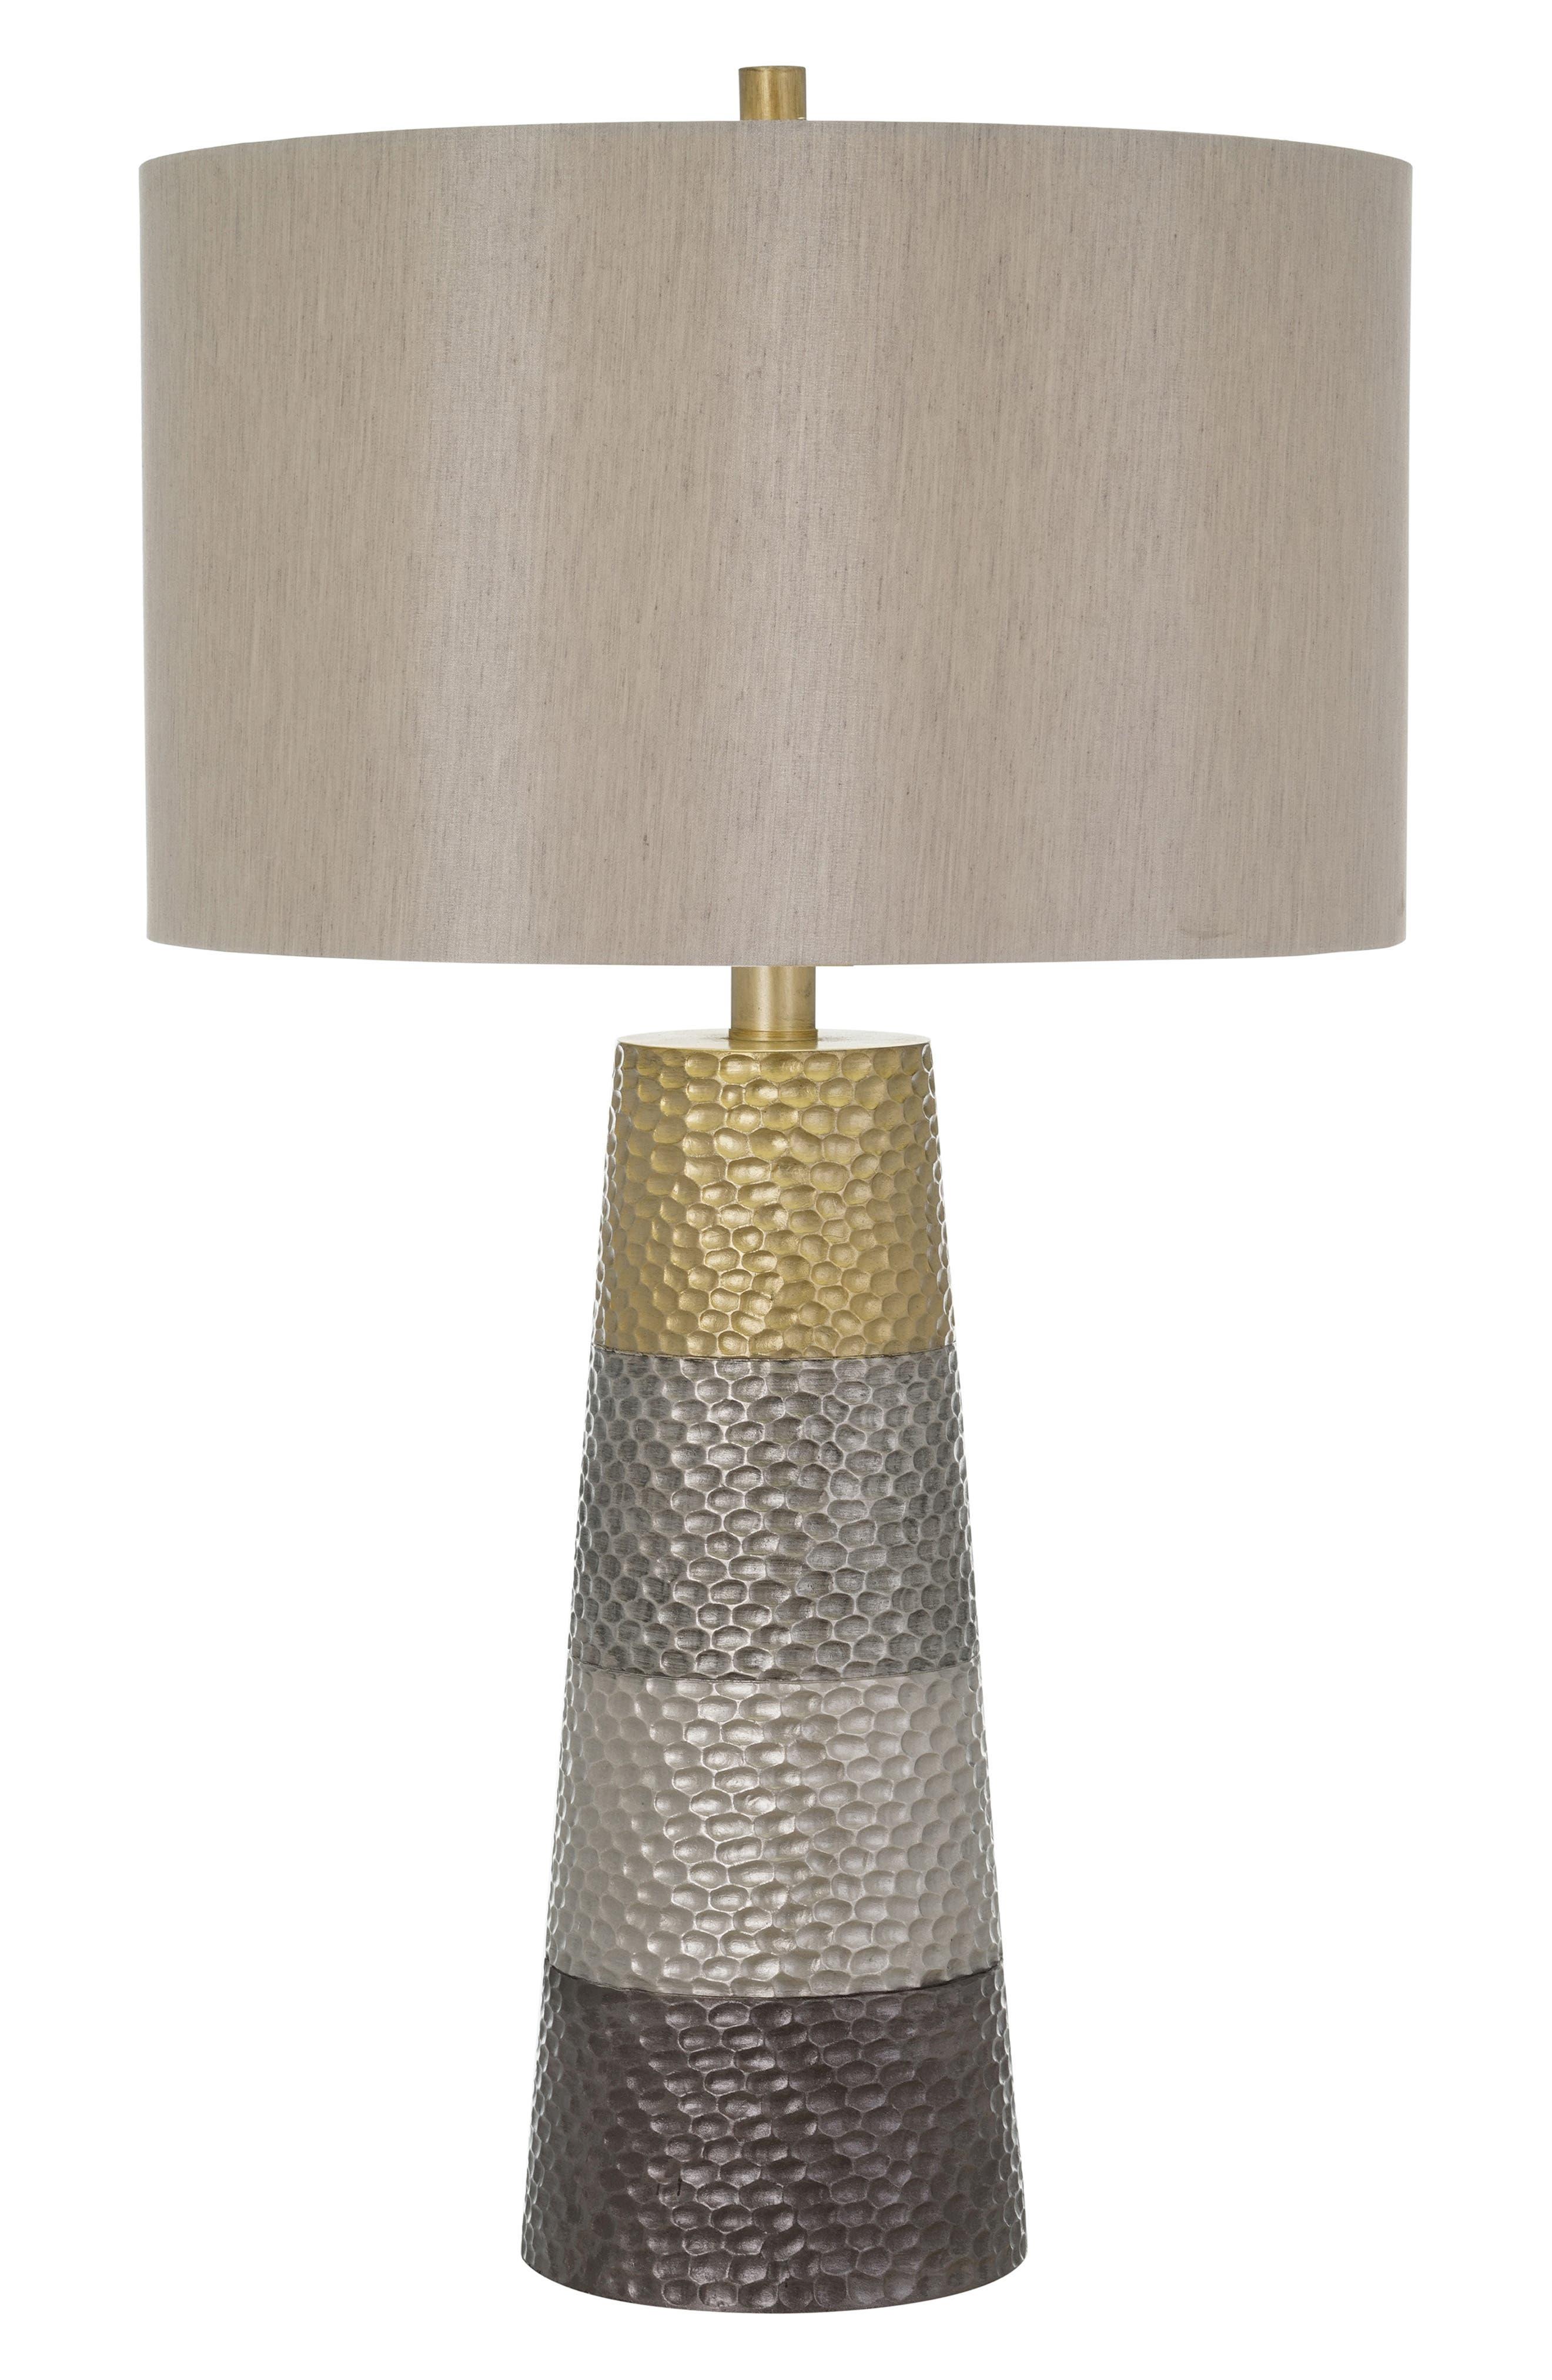 JALEXANDER LIGHTING,                             Delia Table Lamp,                             Alternate thumbnail 2, color,                             048